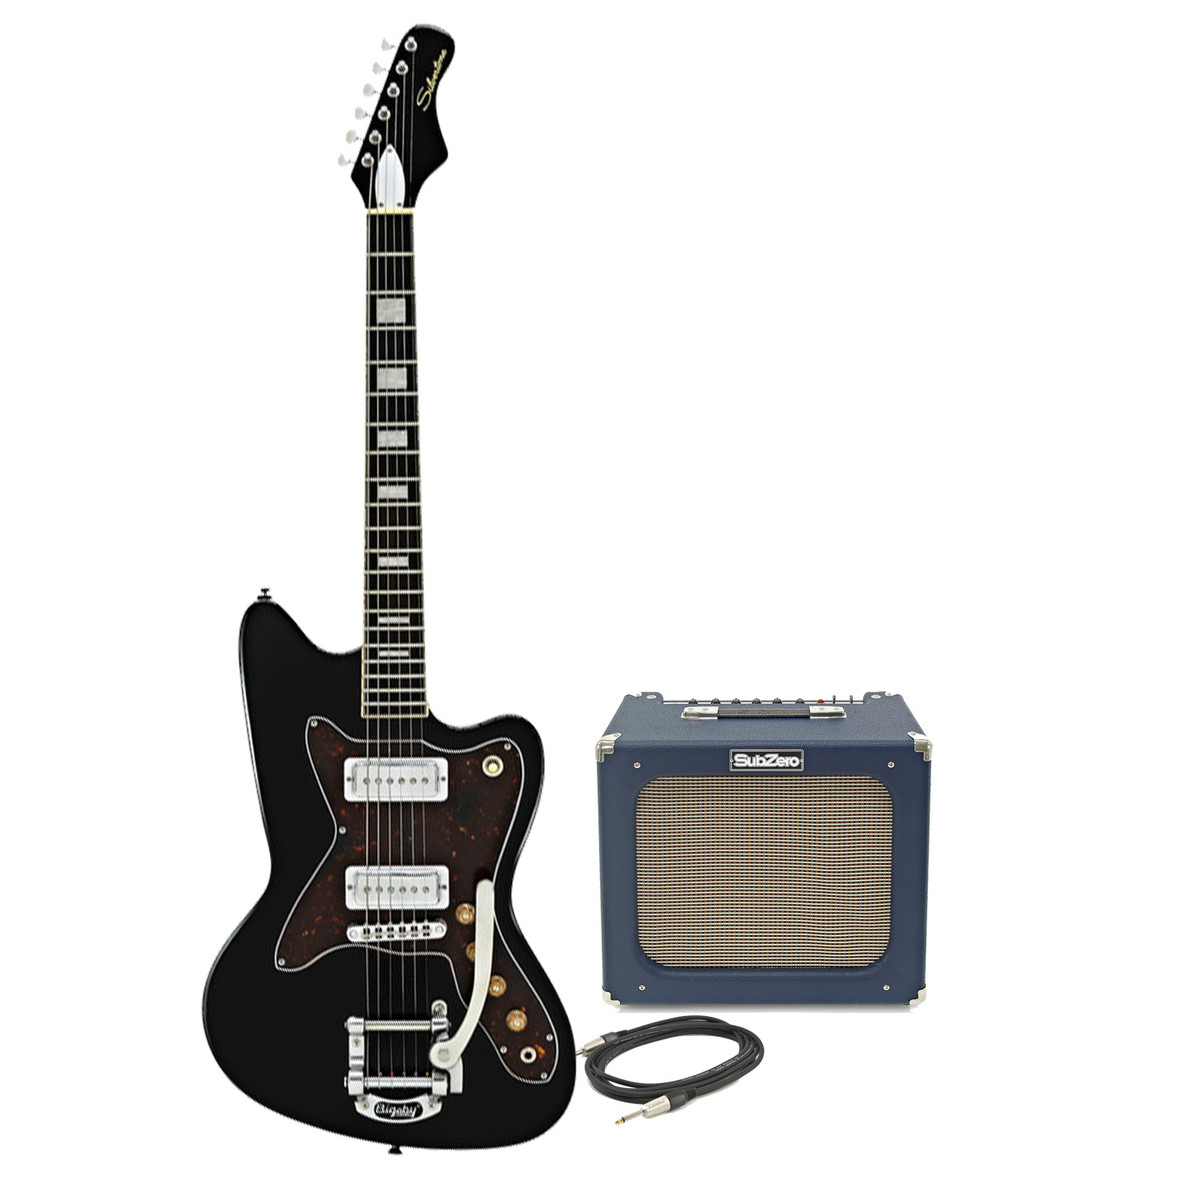 silvertone 1478 electric guitar subzero tube20r amp pack black at gear4music. Black Bedroom Furniture Sets. Home Design Ideas